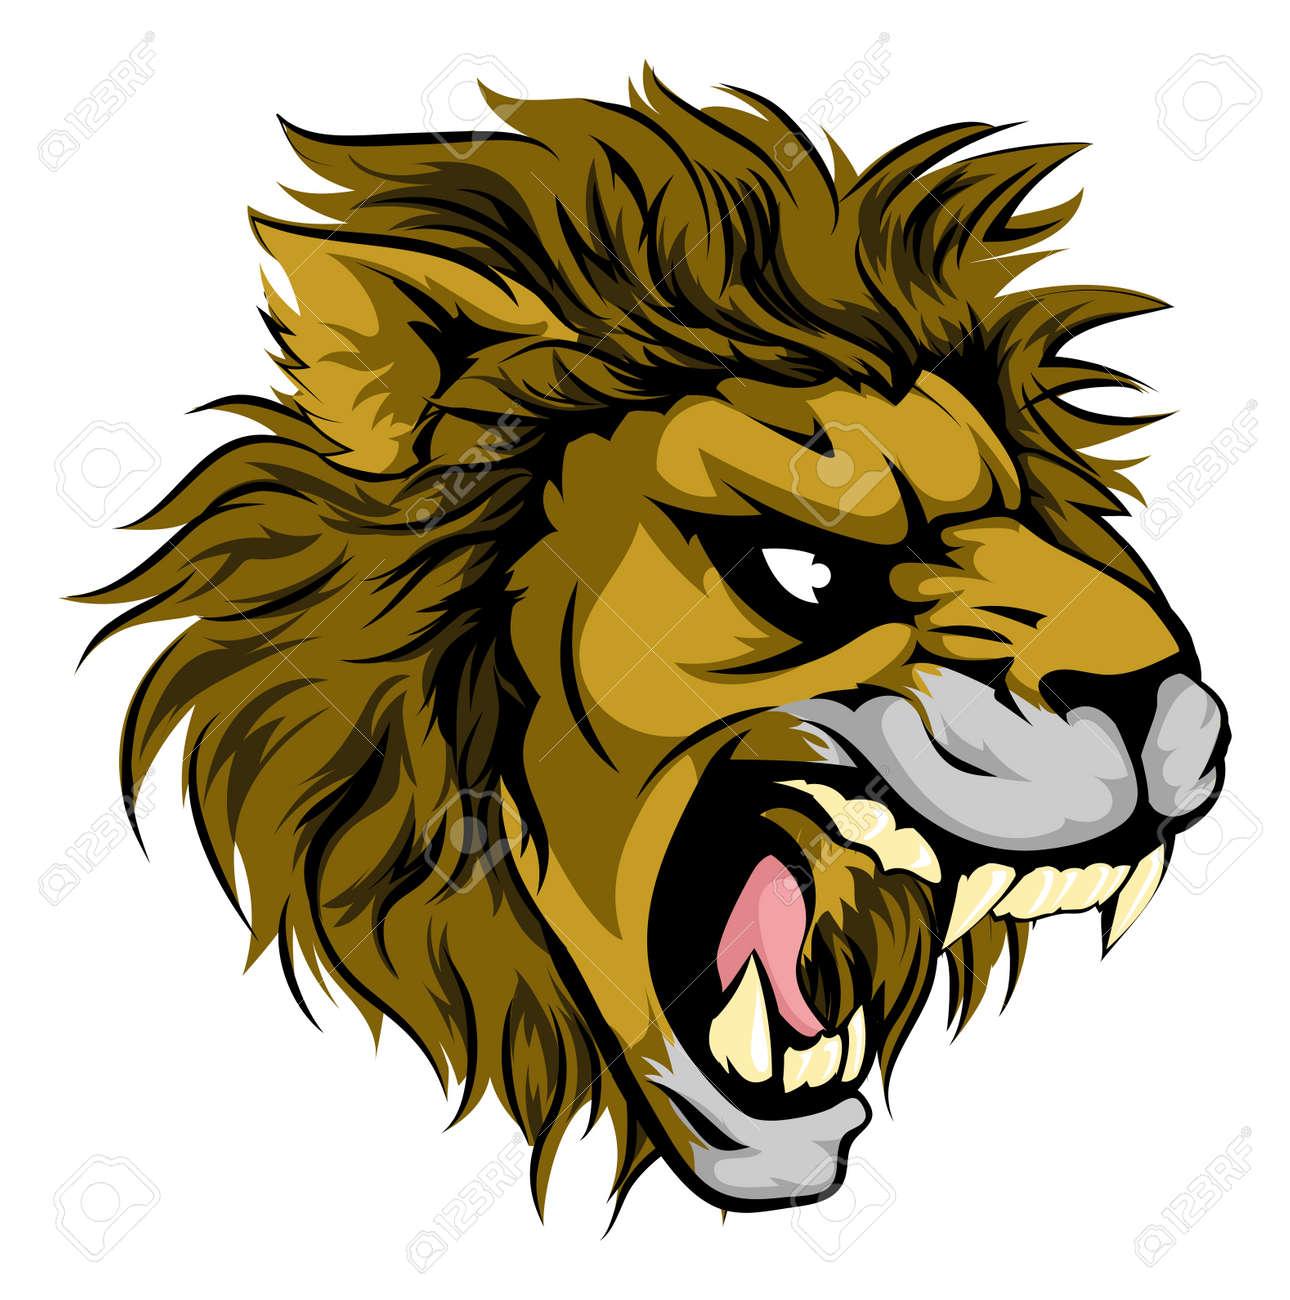 Majestic Lion Hand Painted Elements Lion King   Painting, Lion, Graphic  design background templates